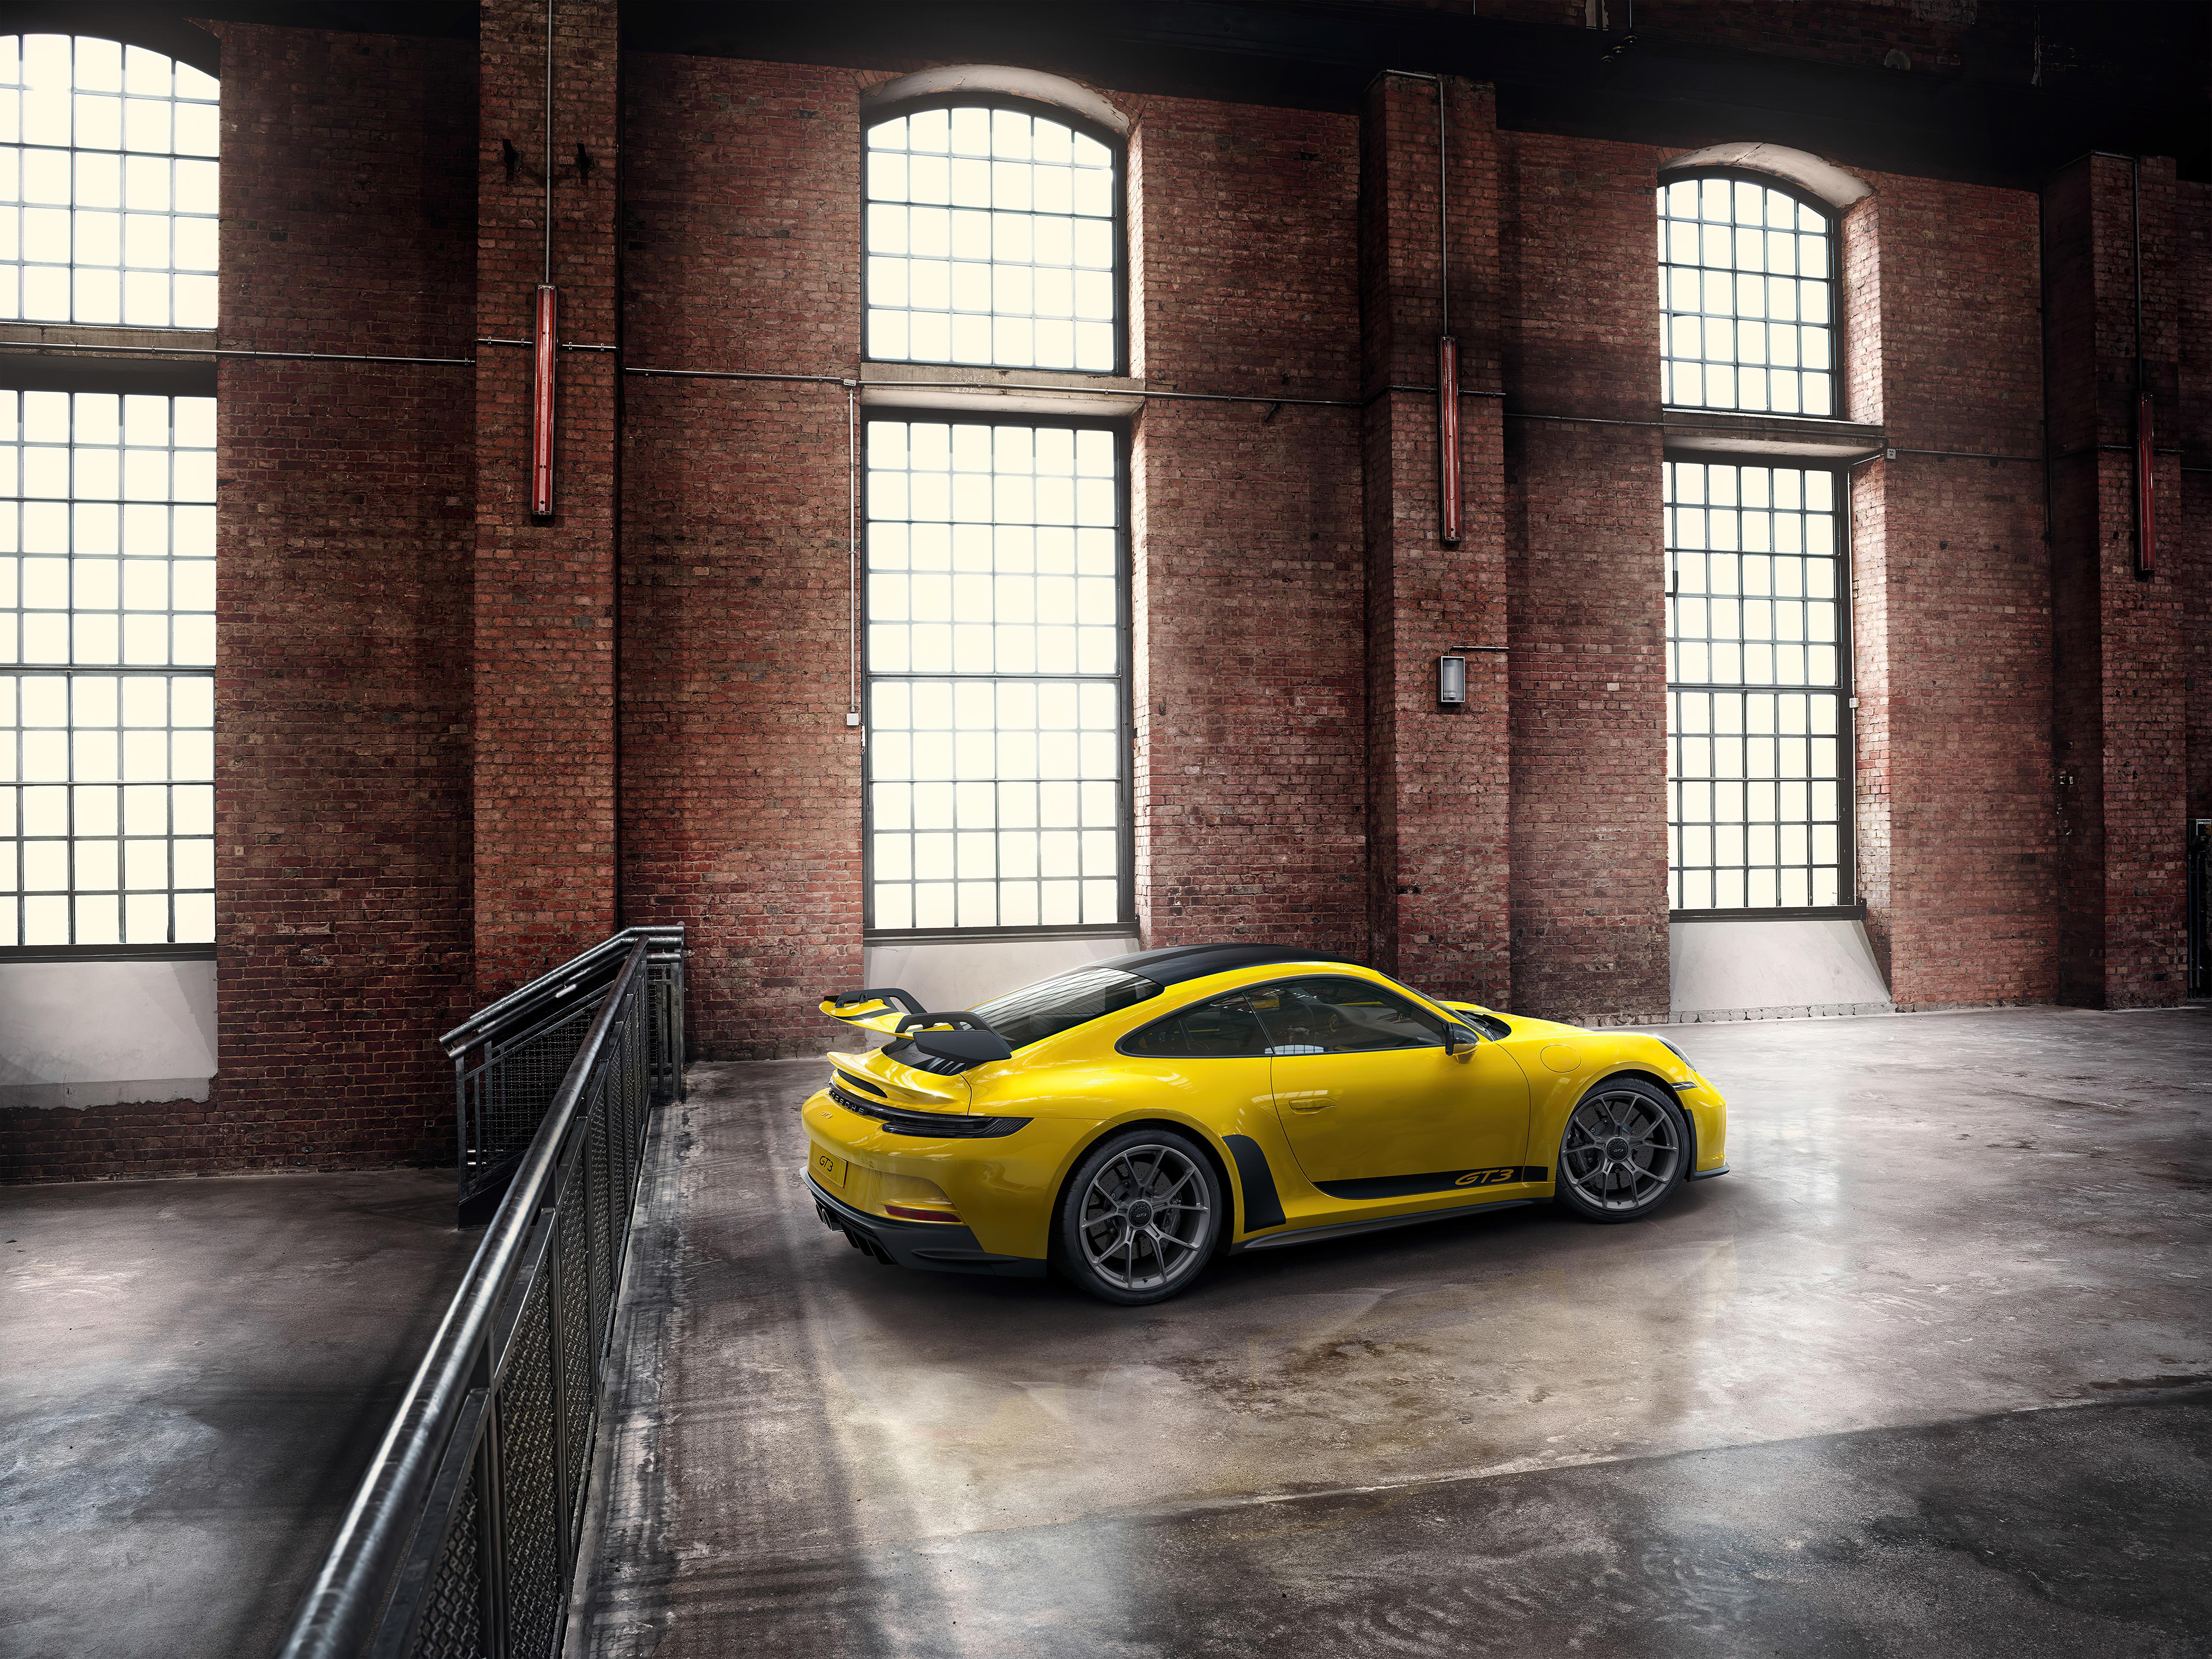 porsche 911 gt3 exclusive 4k 1620171763 1 - Porsche 911 GT3 Exclusive 4k - Porsche 911 GT3 Exclusive 4k wallpapers